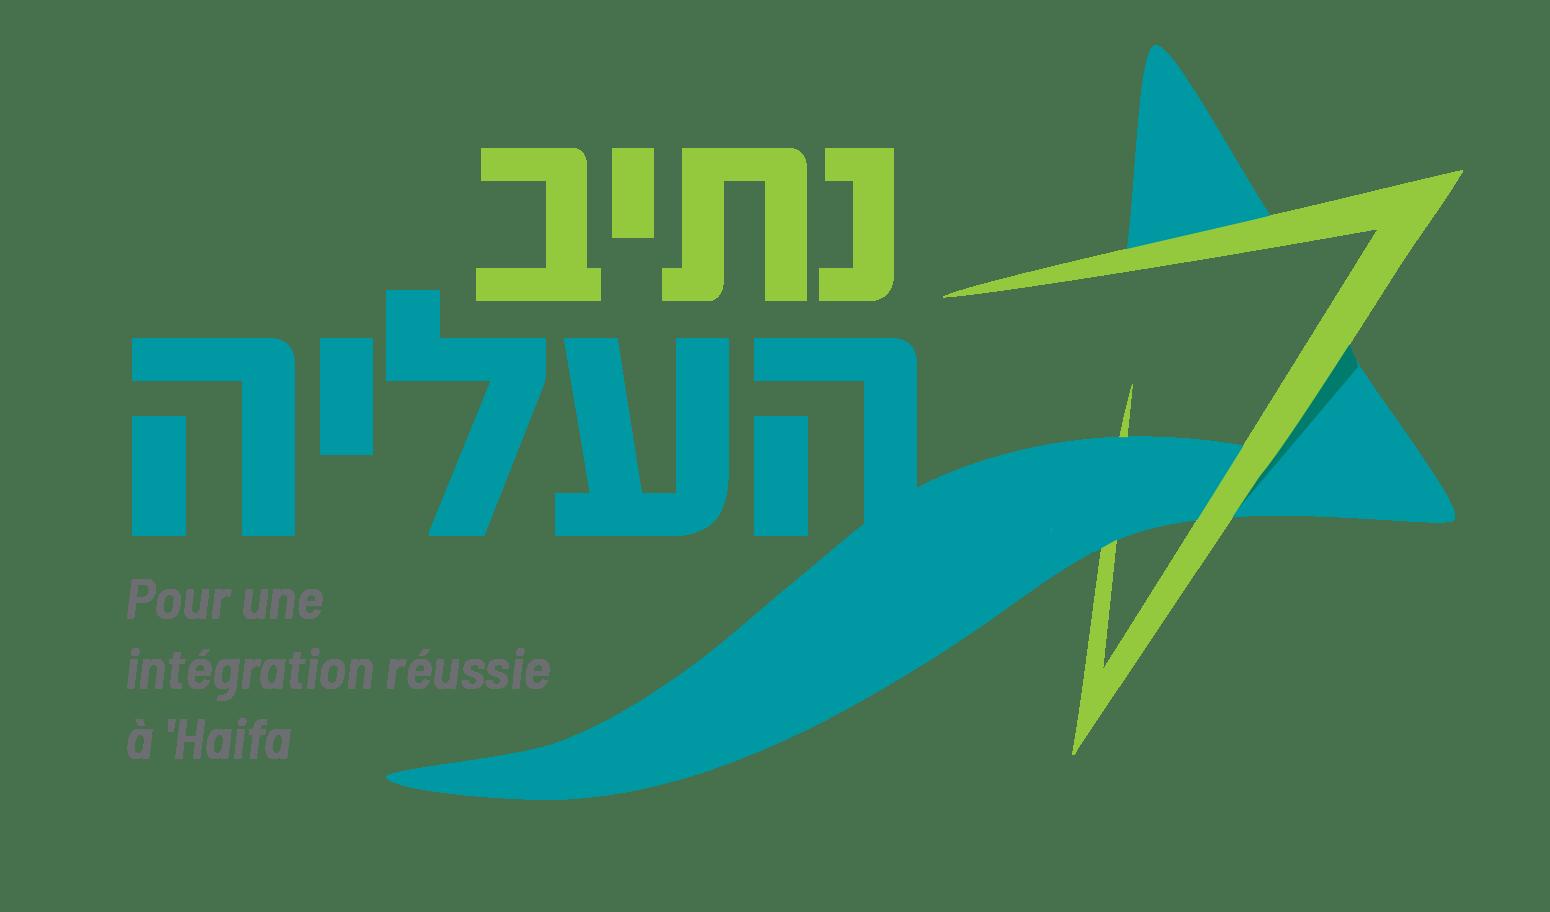 Logo_Netiv_Haaliya-05